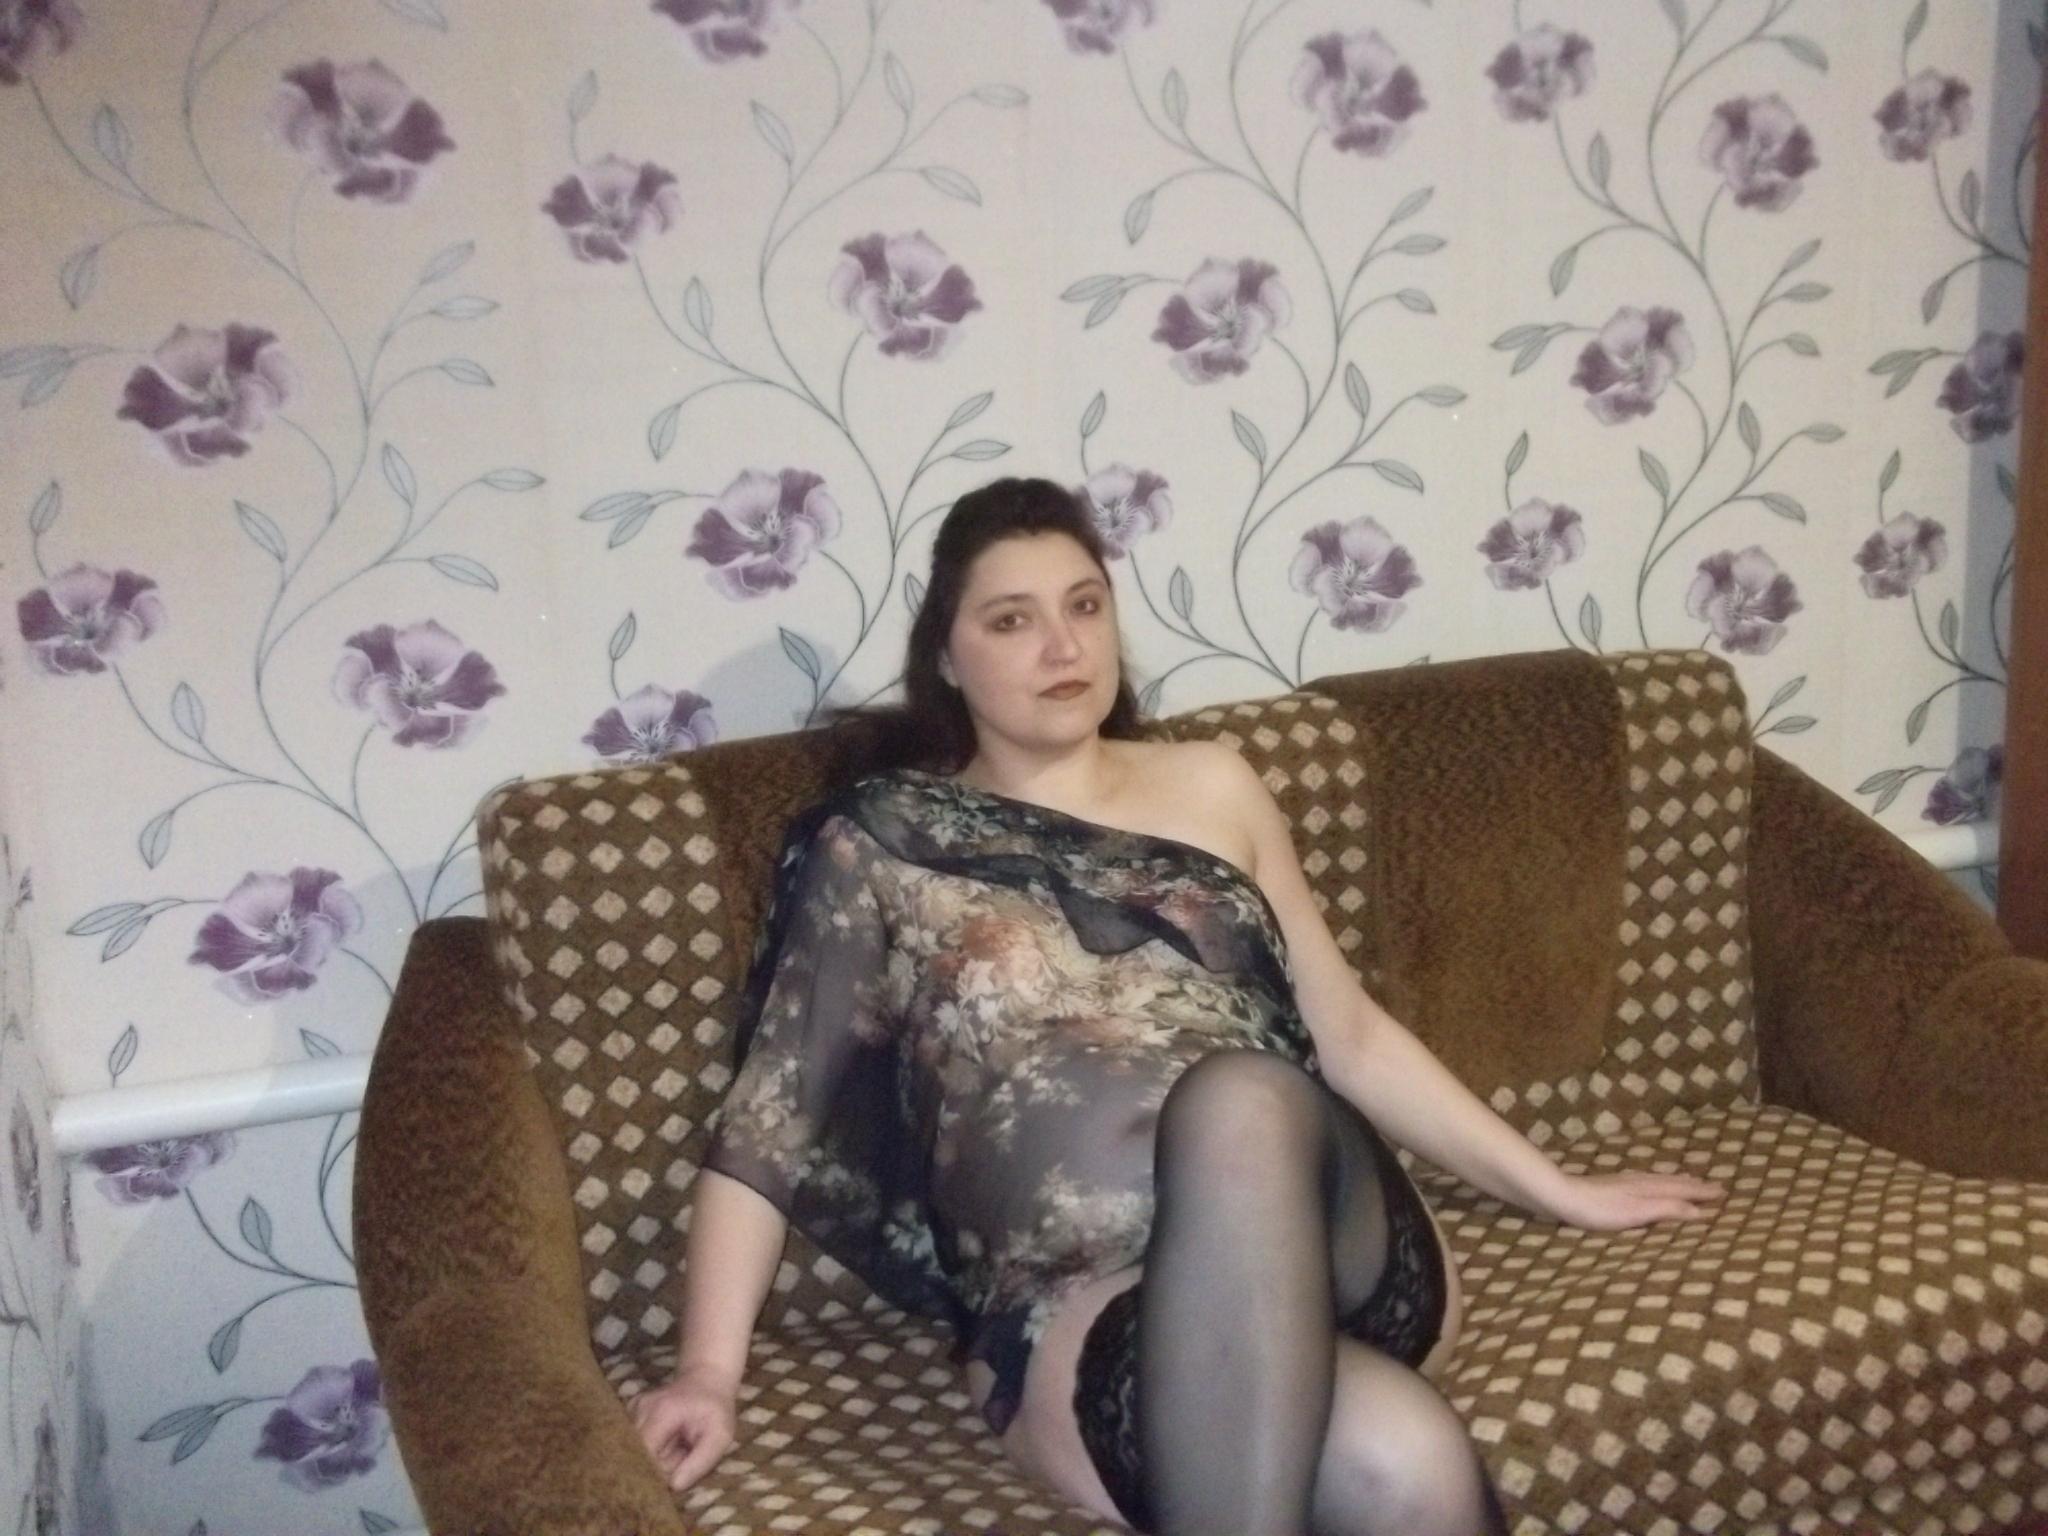 знакомства госпожа ищет раба vbulletin